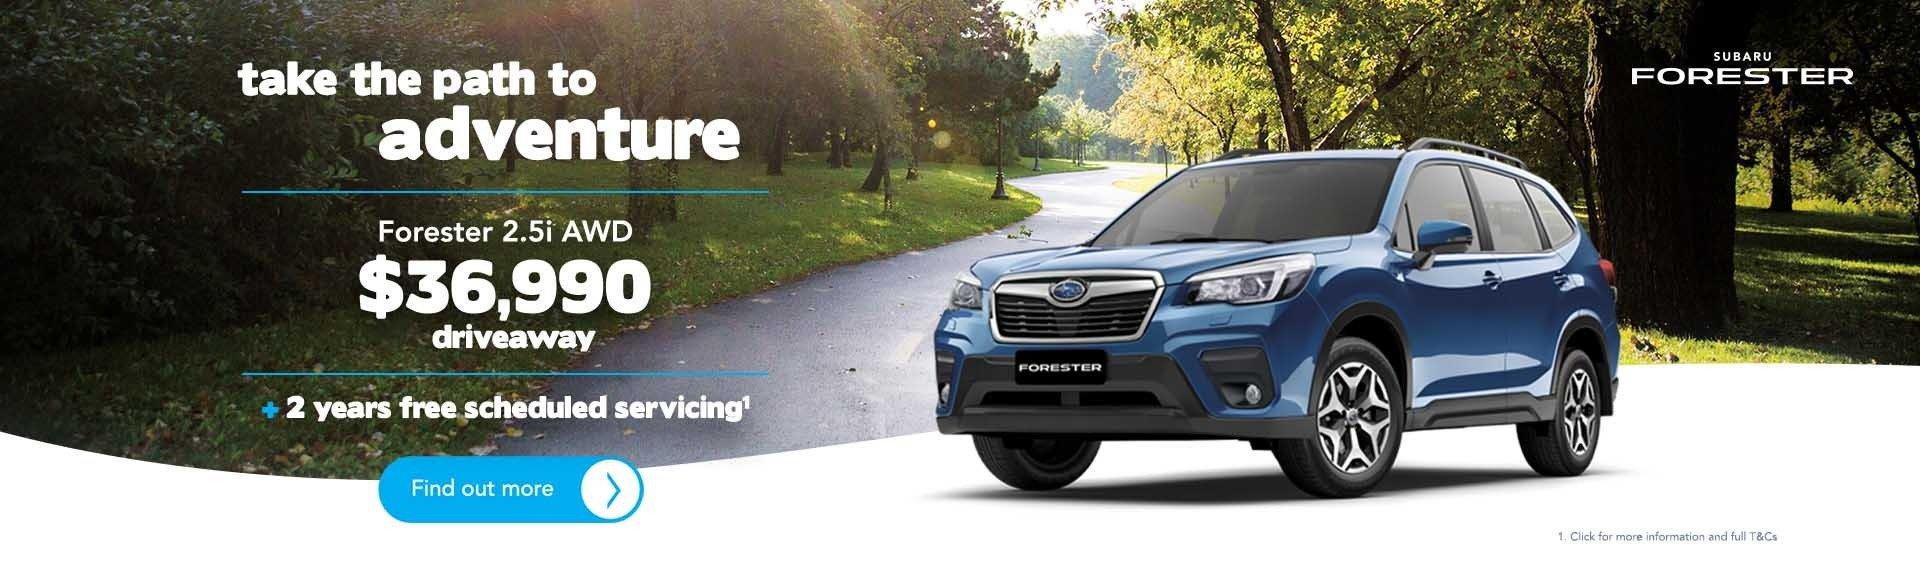 Subaru Penrith - Forester Offer